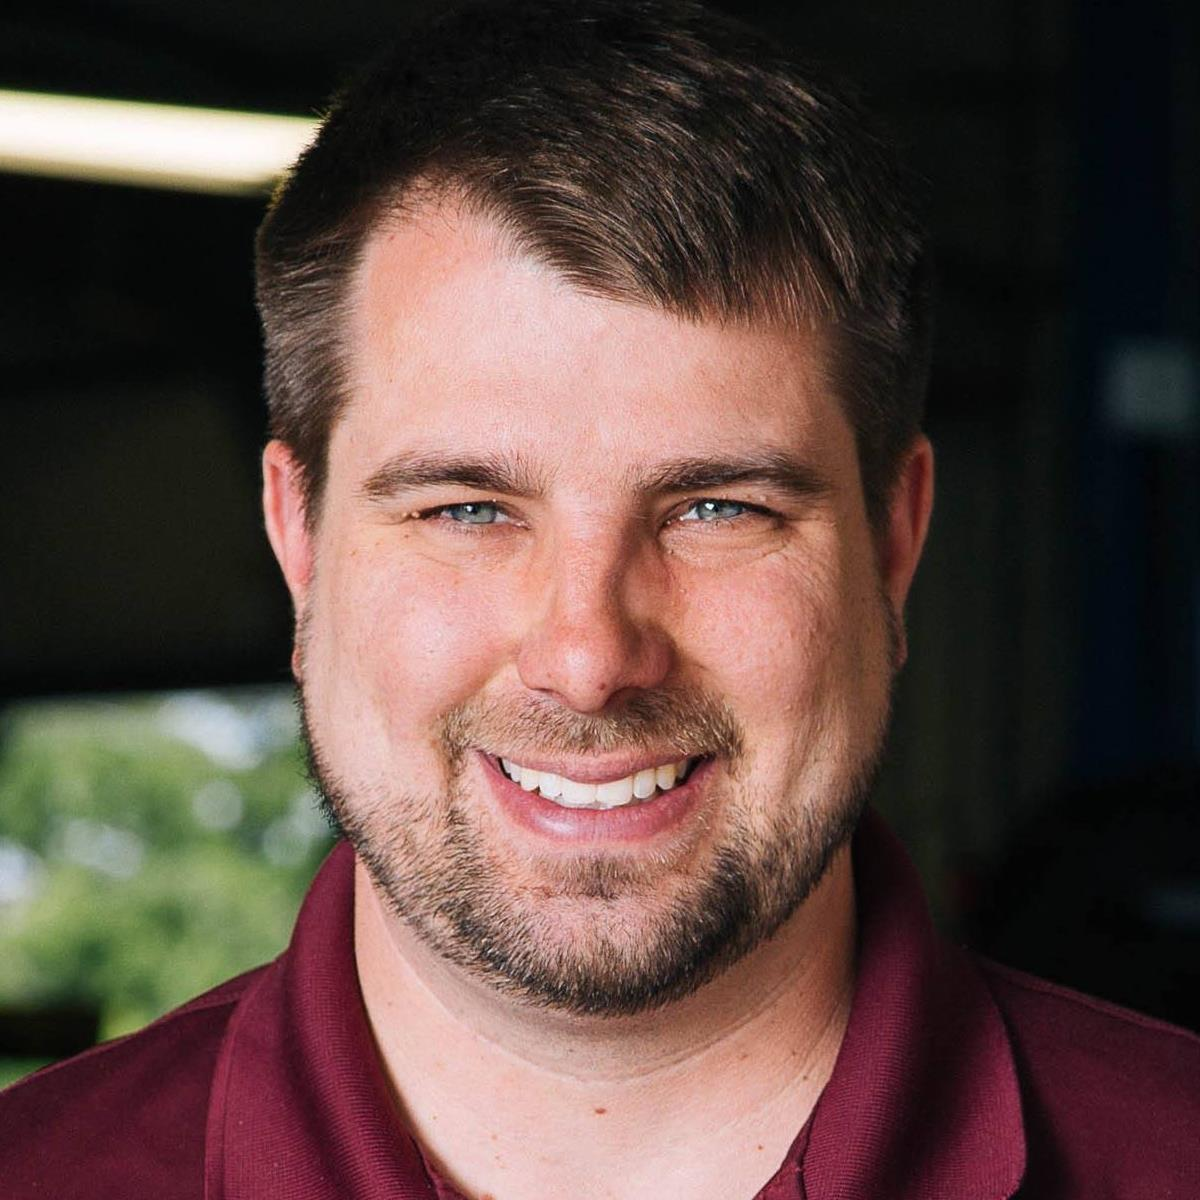 Michael Rosenberger, Owner of Tommy's Hi Tech Auto Repair Shop